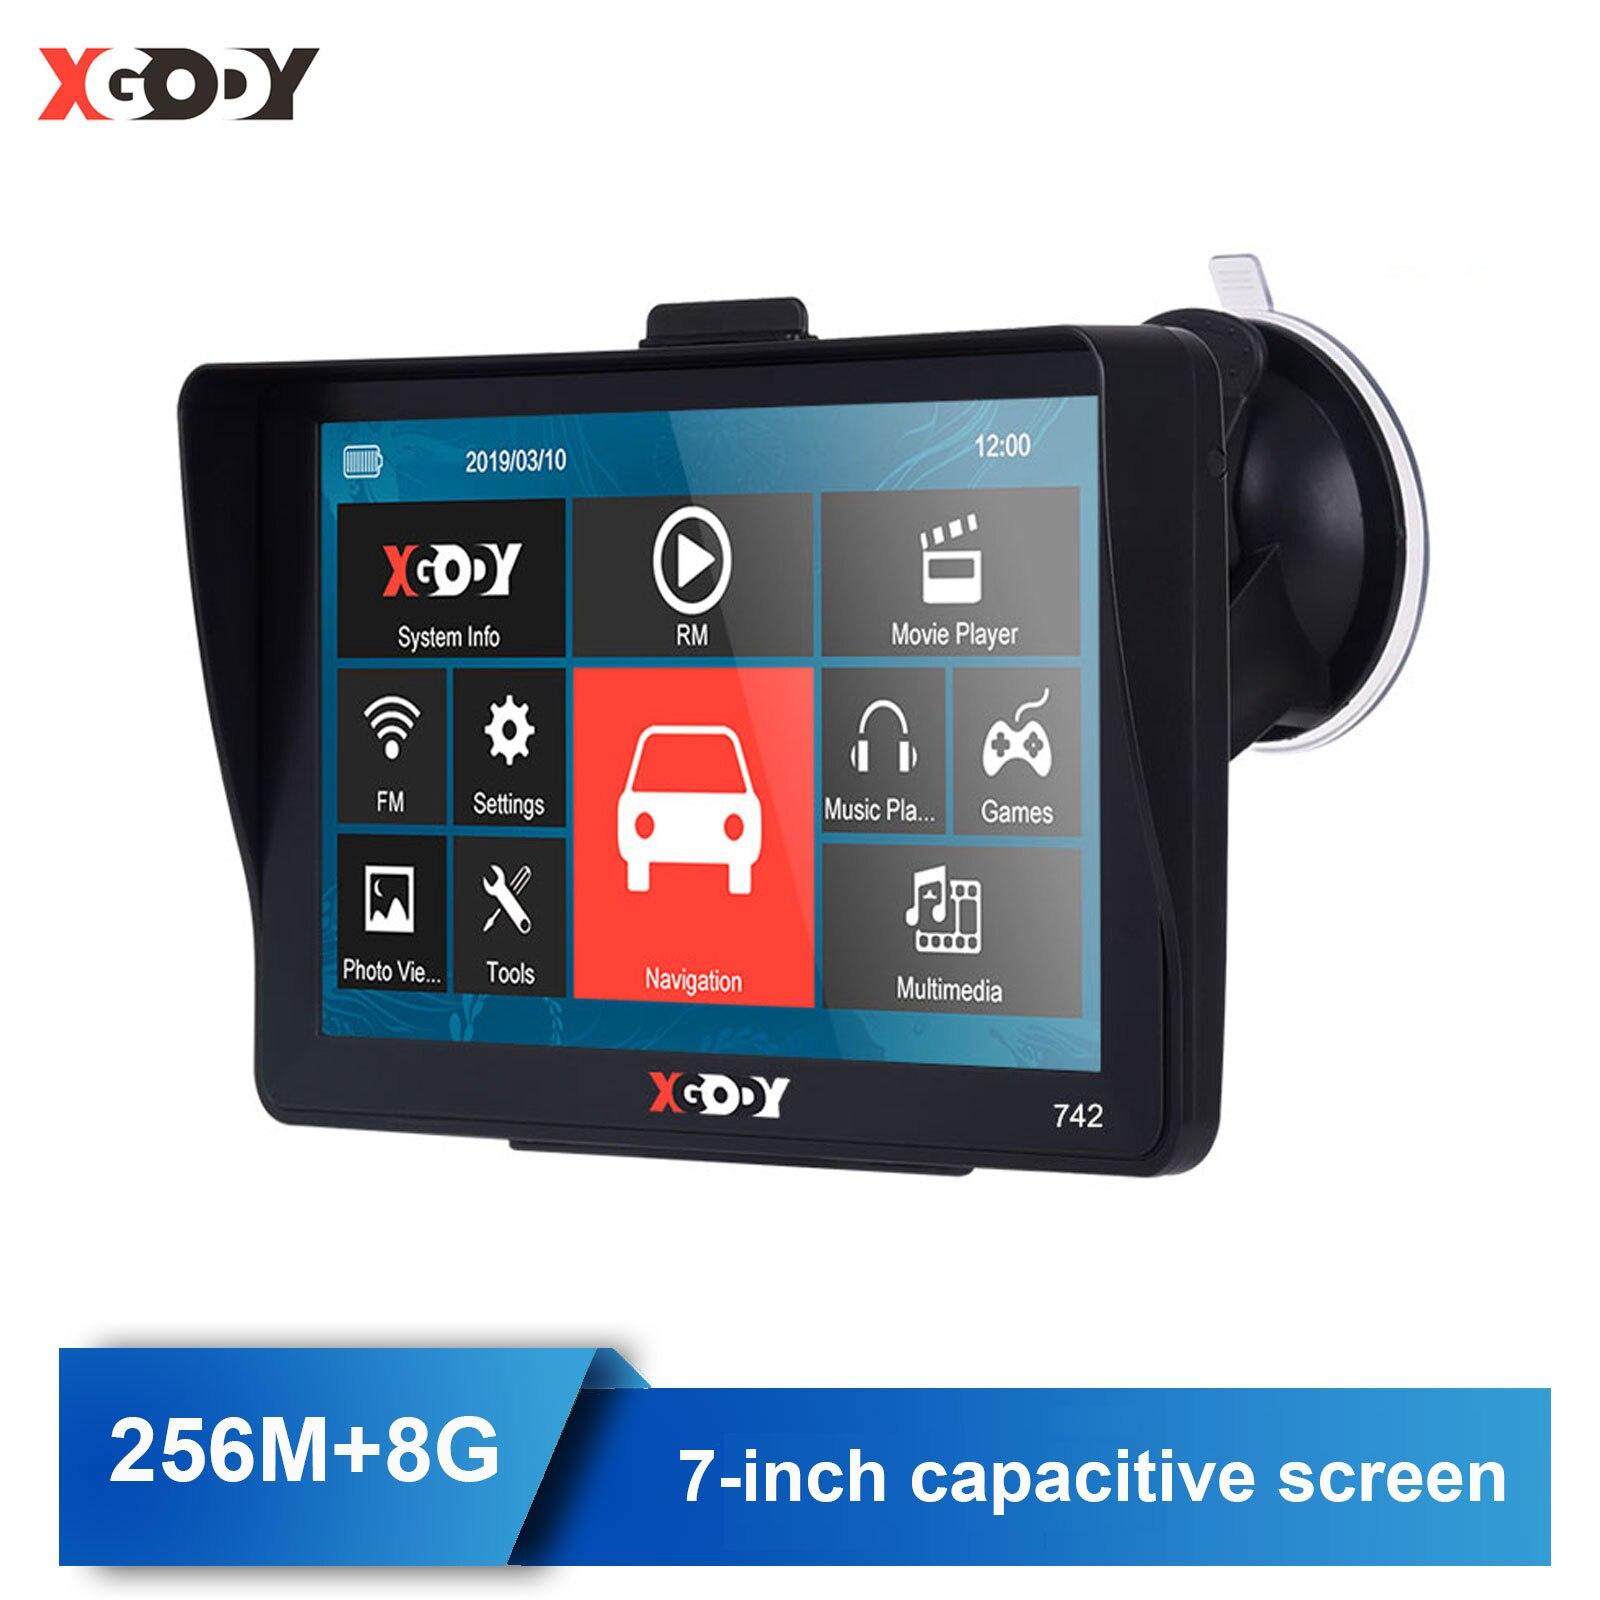 Xgody 742 Car GPS Navigator 7 inch Truck GPS Navigation With Sunshade Touch Screen 256M+8G Sat Nav Russia Navitel Free Maps FM